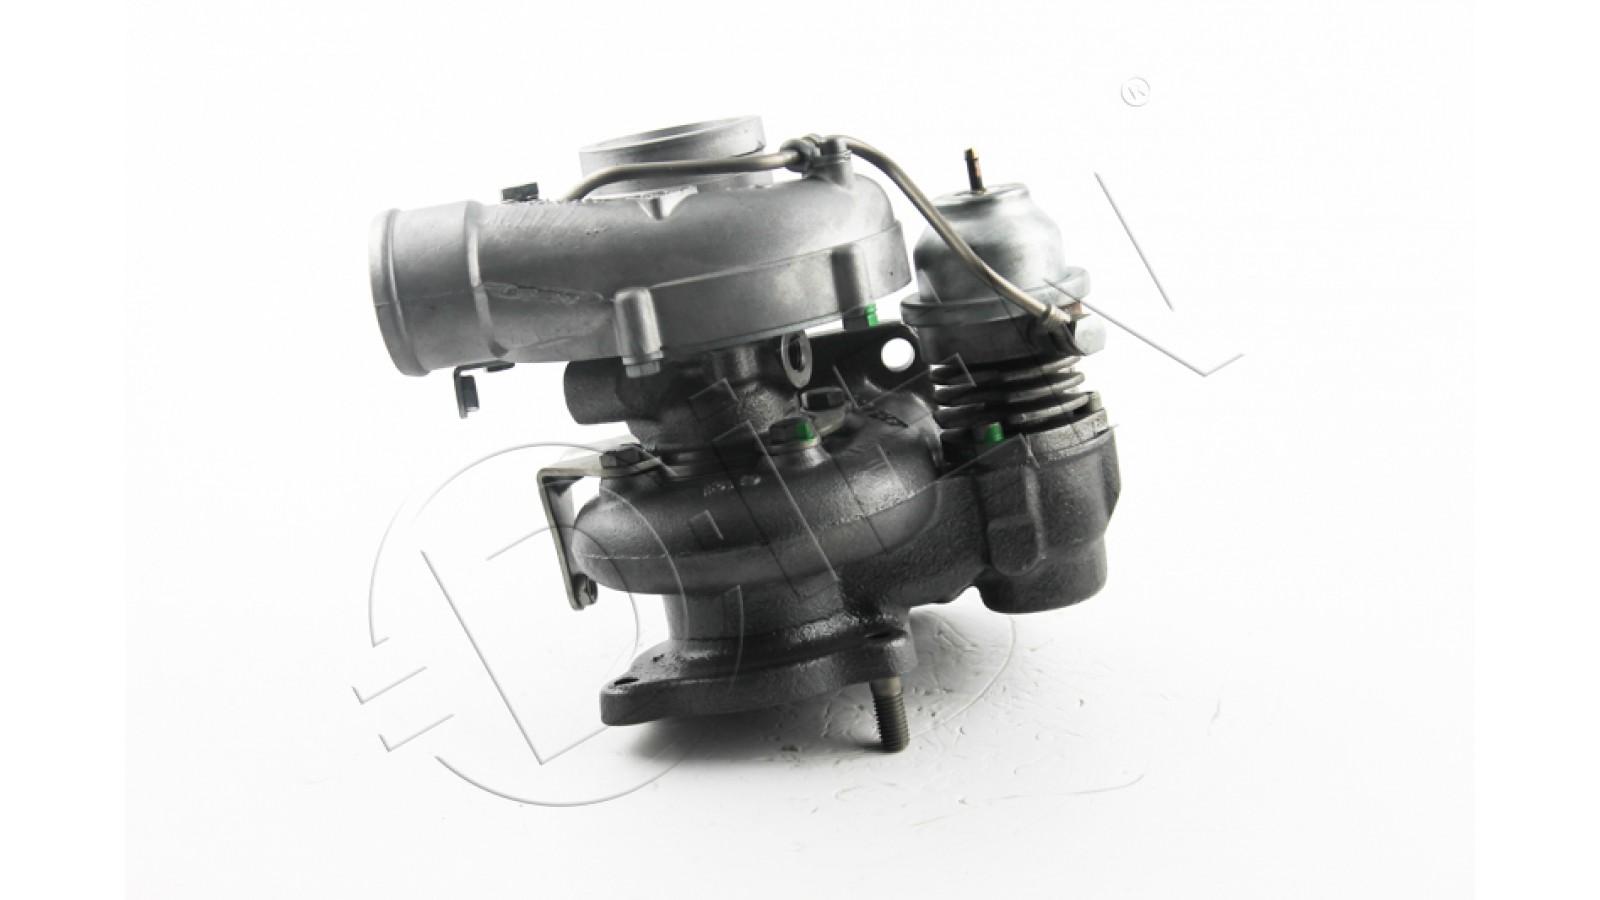 Turbocompressore  VOLVO  S70  2.5 TDI  140Cv  2461ccm  gen 1997 - nov 2000